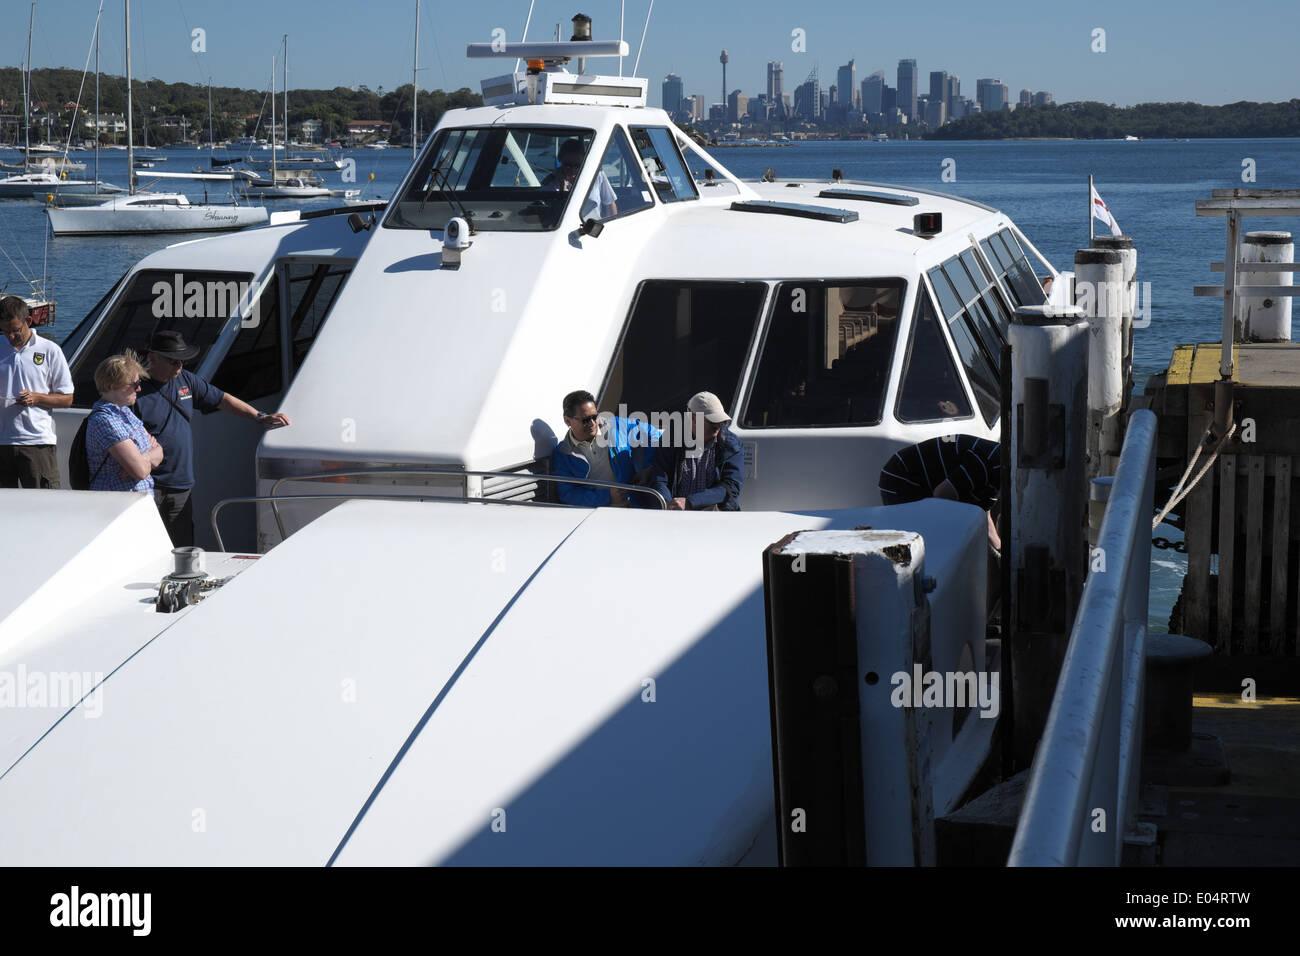 sydney ferry arrives at Watsons bay in sydney eastern suburbs,australia - Stock Image